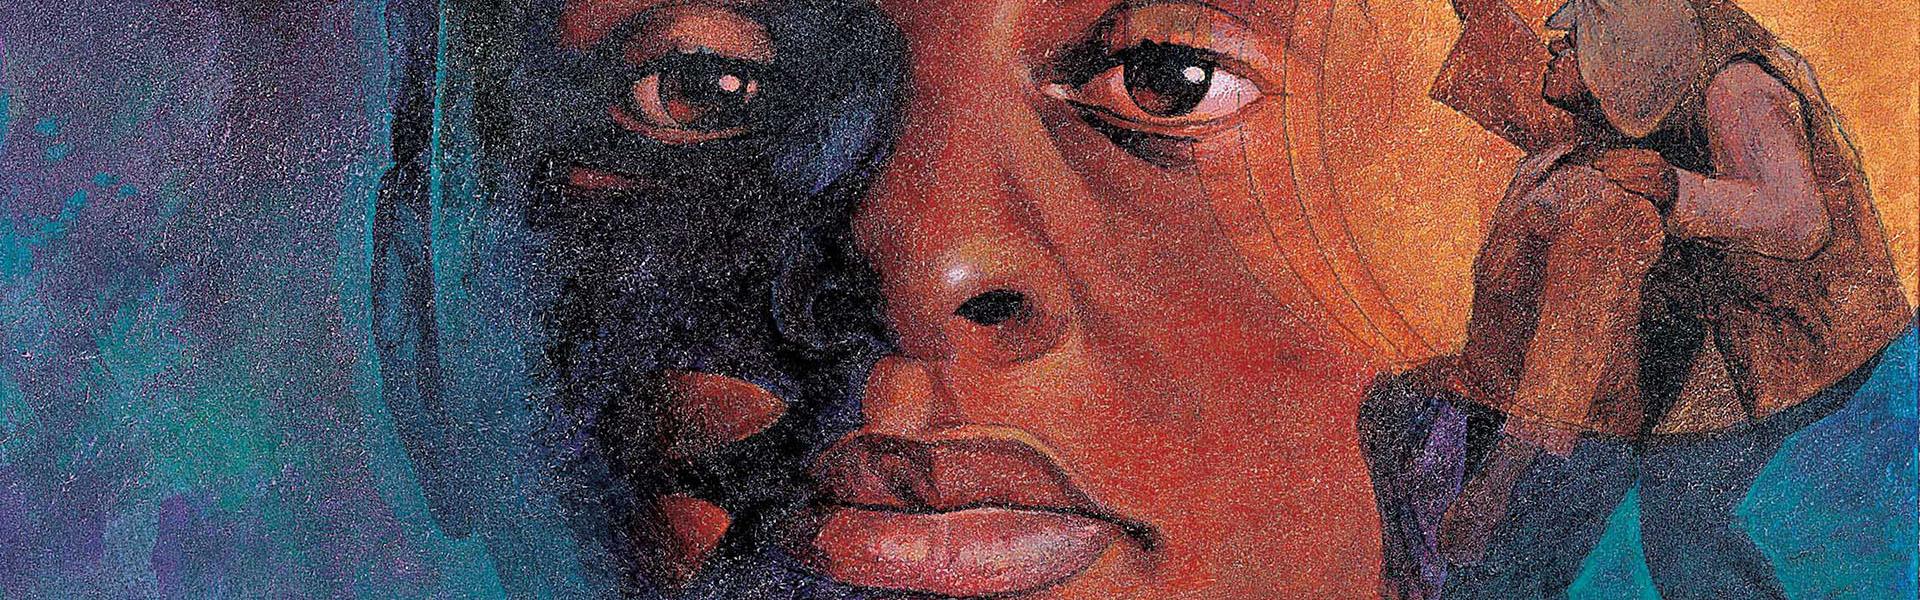 Peinture afro-américaine